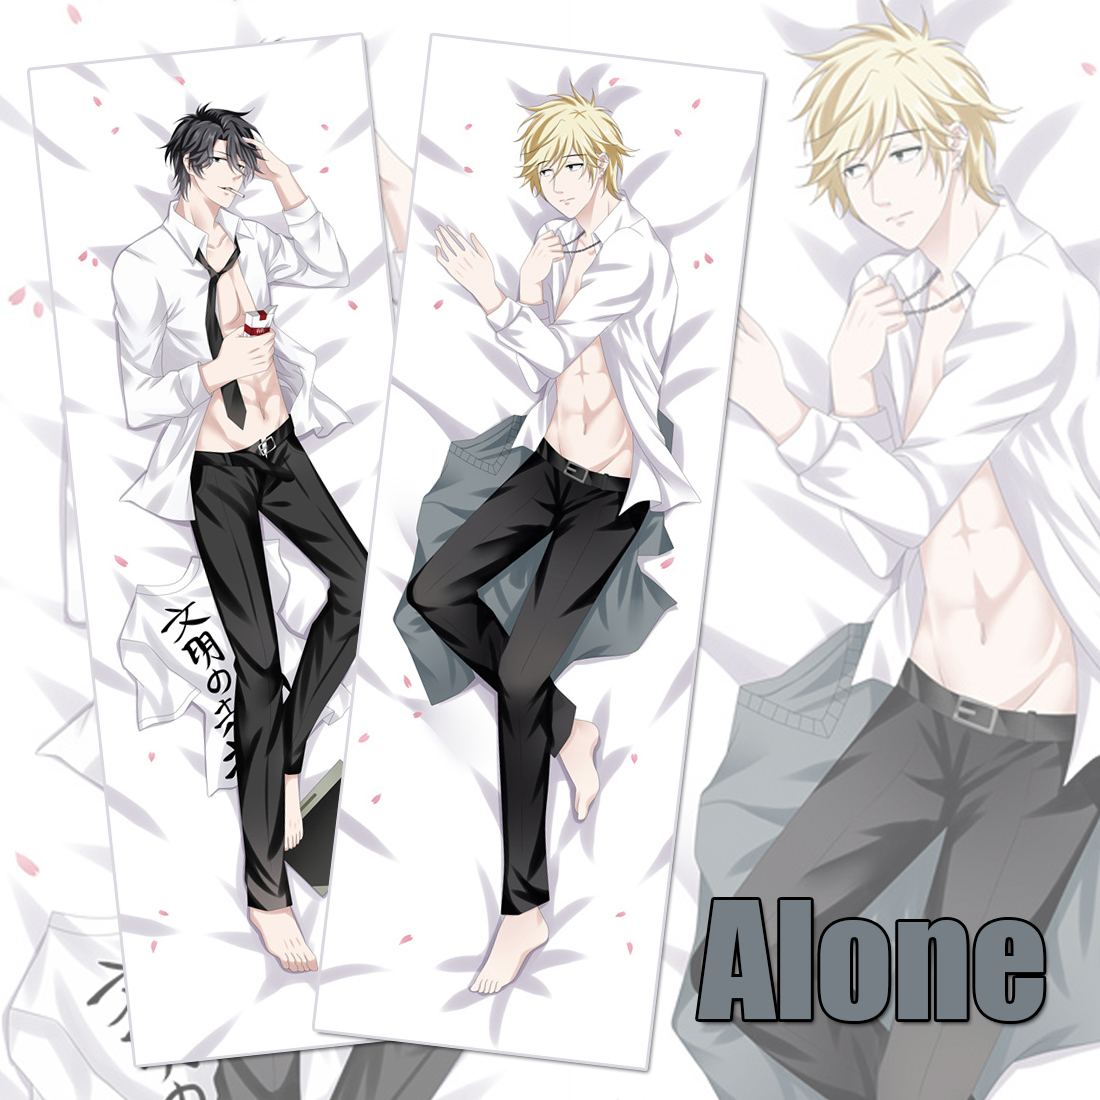 Anime hitorijime my hero bl male dakimakura hugging body pillow cover case 150cm